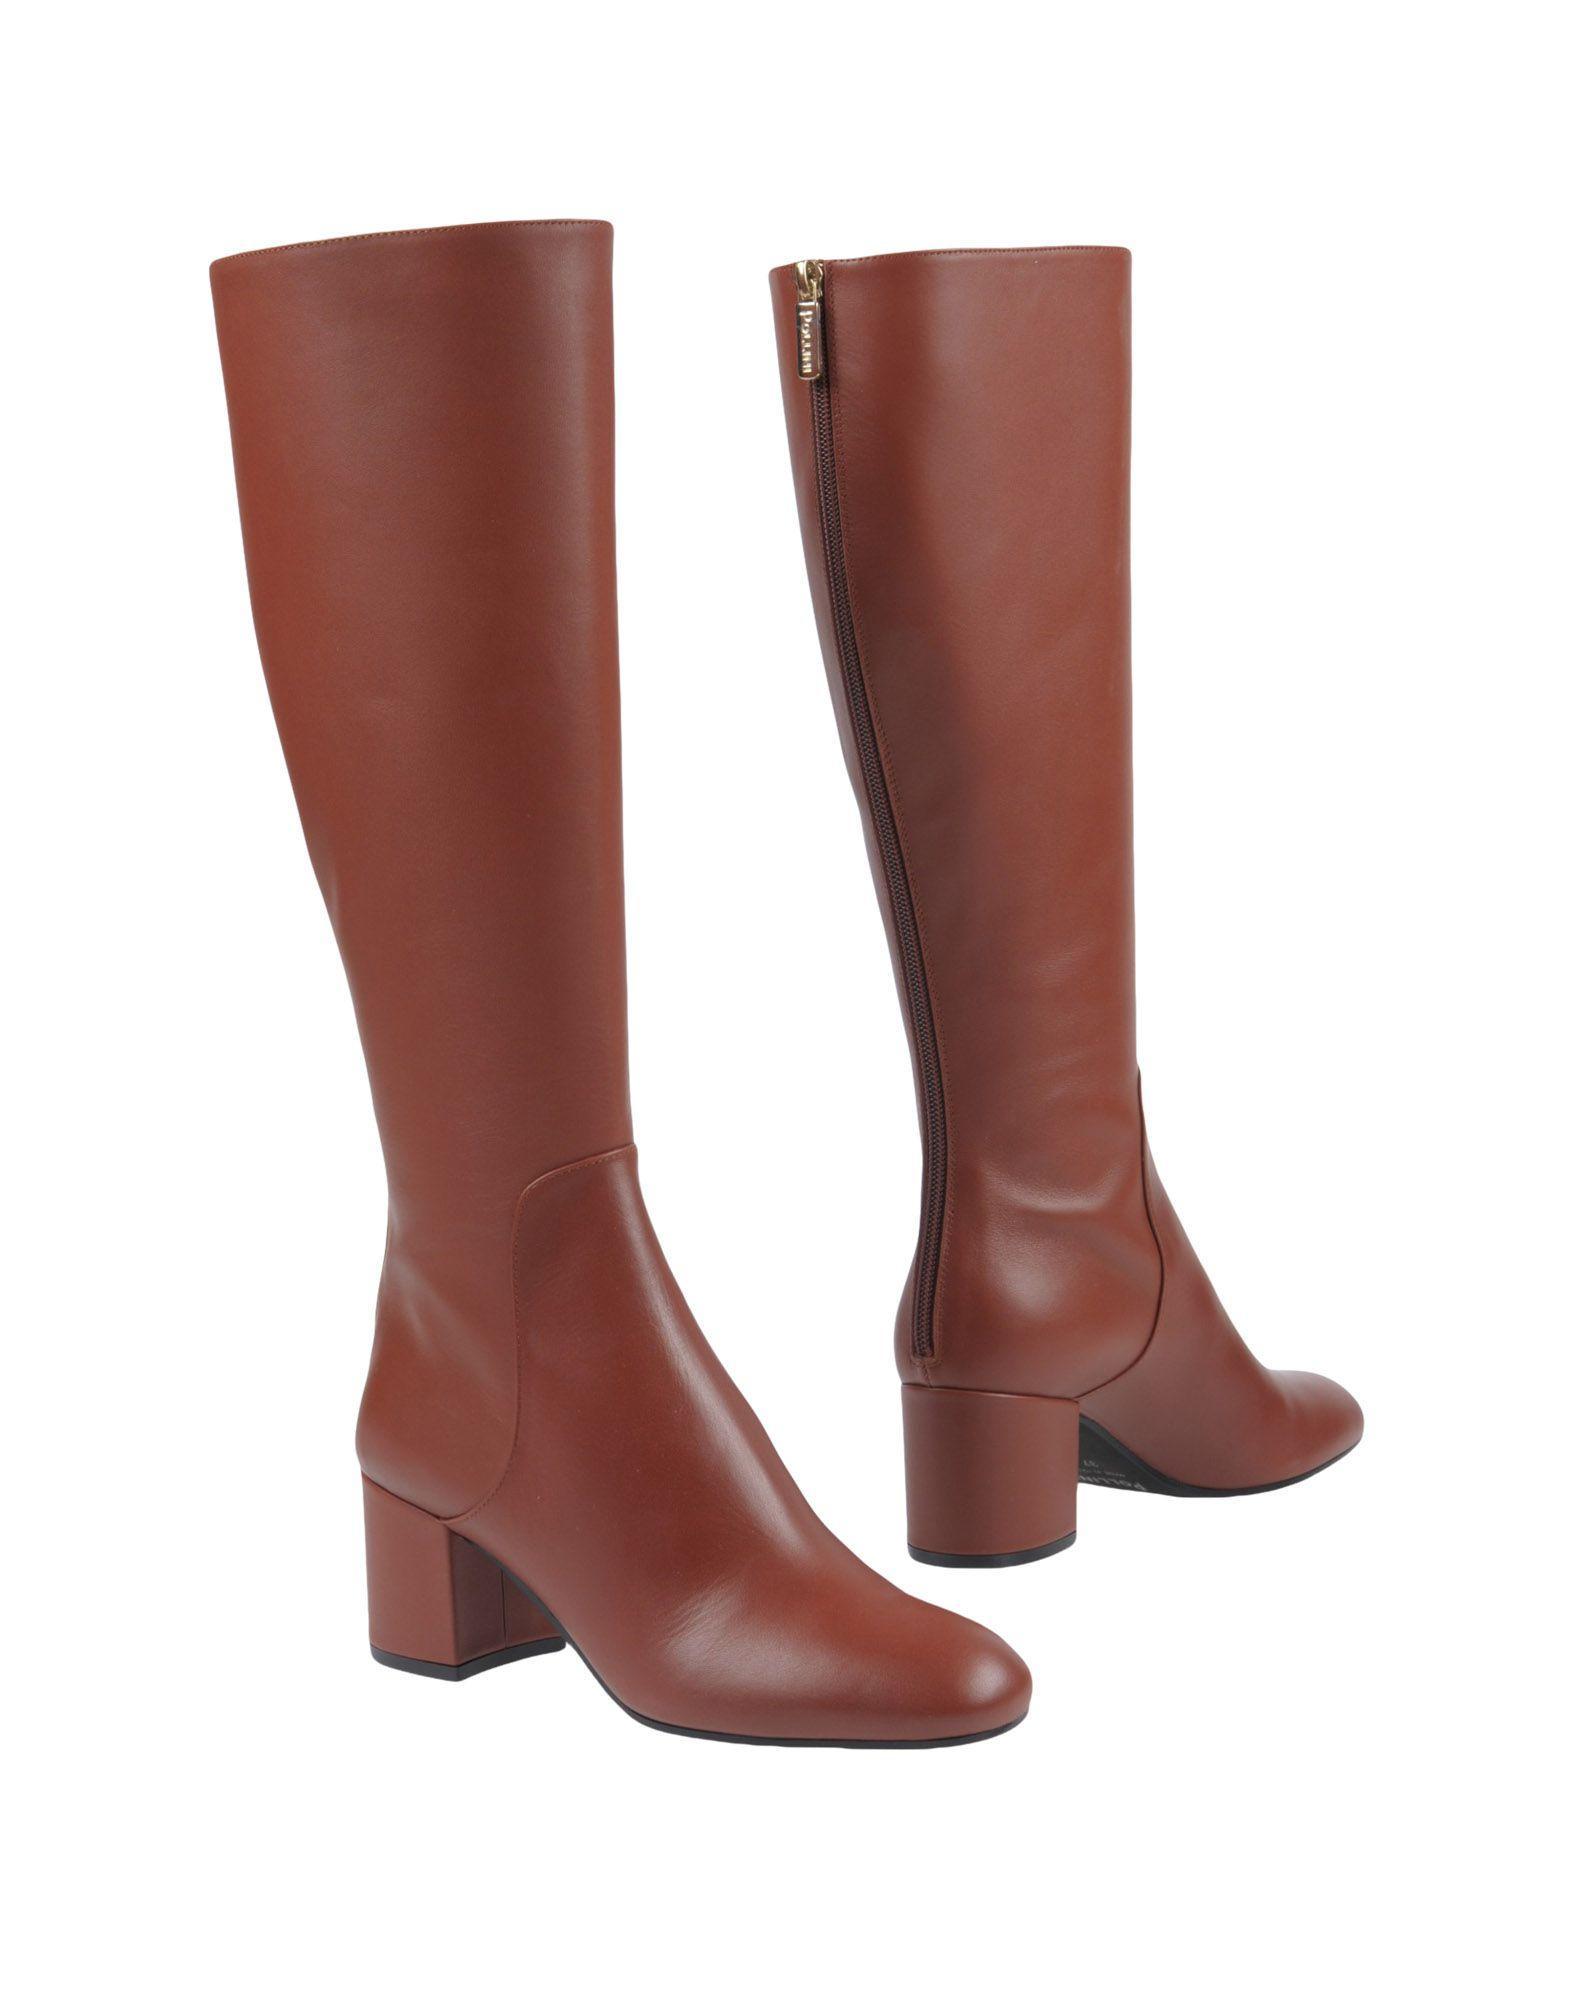 Pollini Boots In Rust